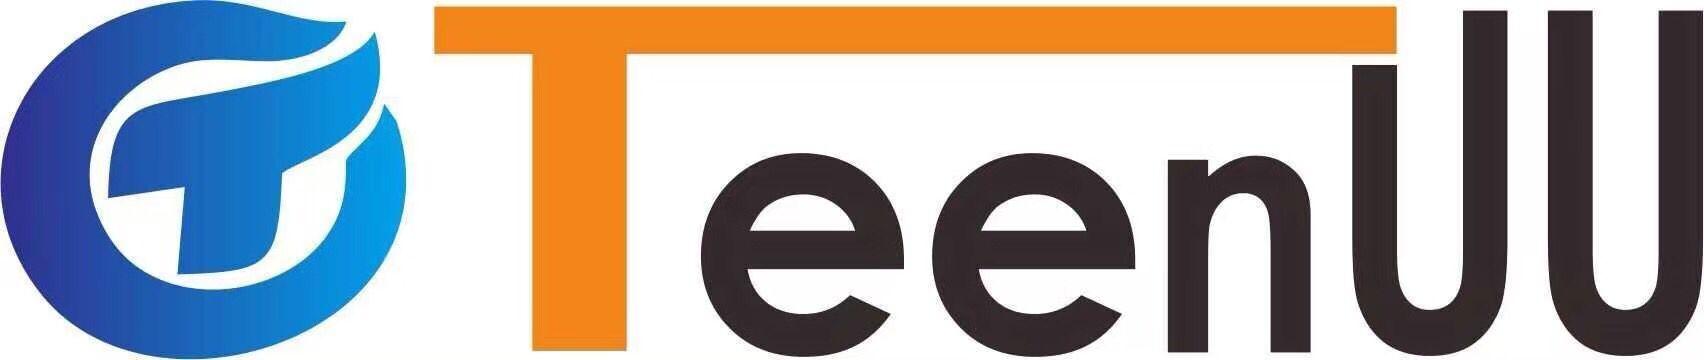 logo 标识 标志 设计 图标 1704_360